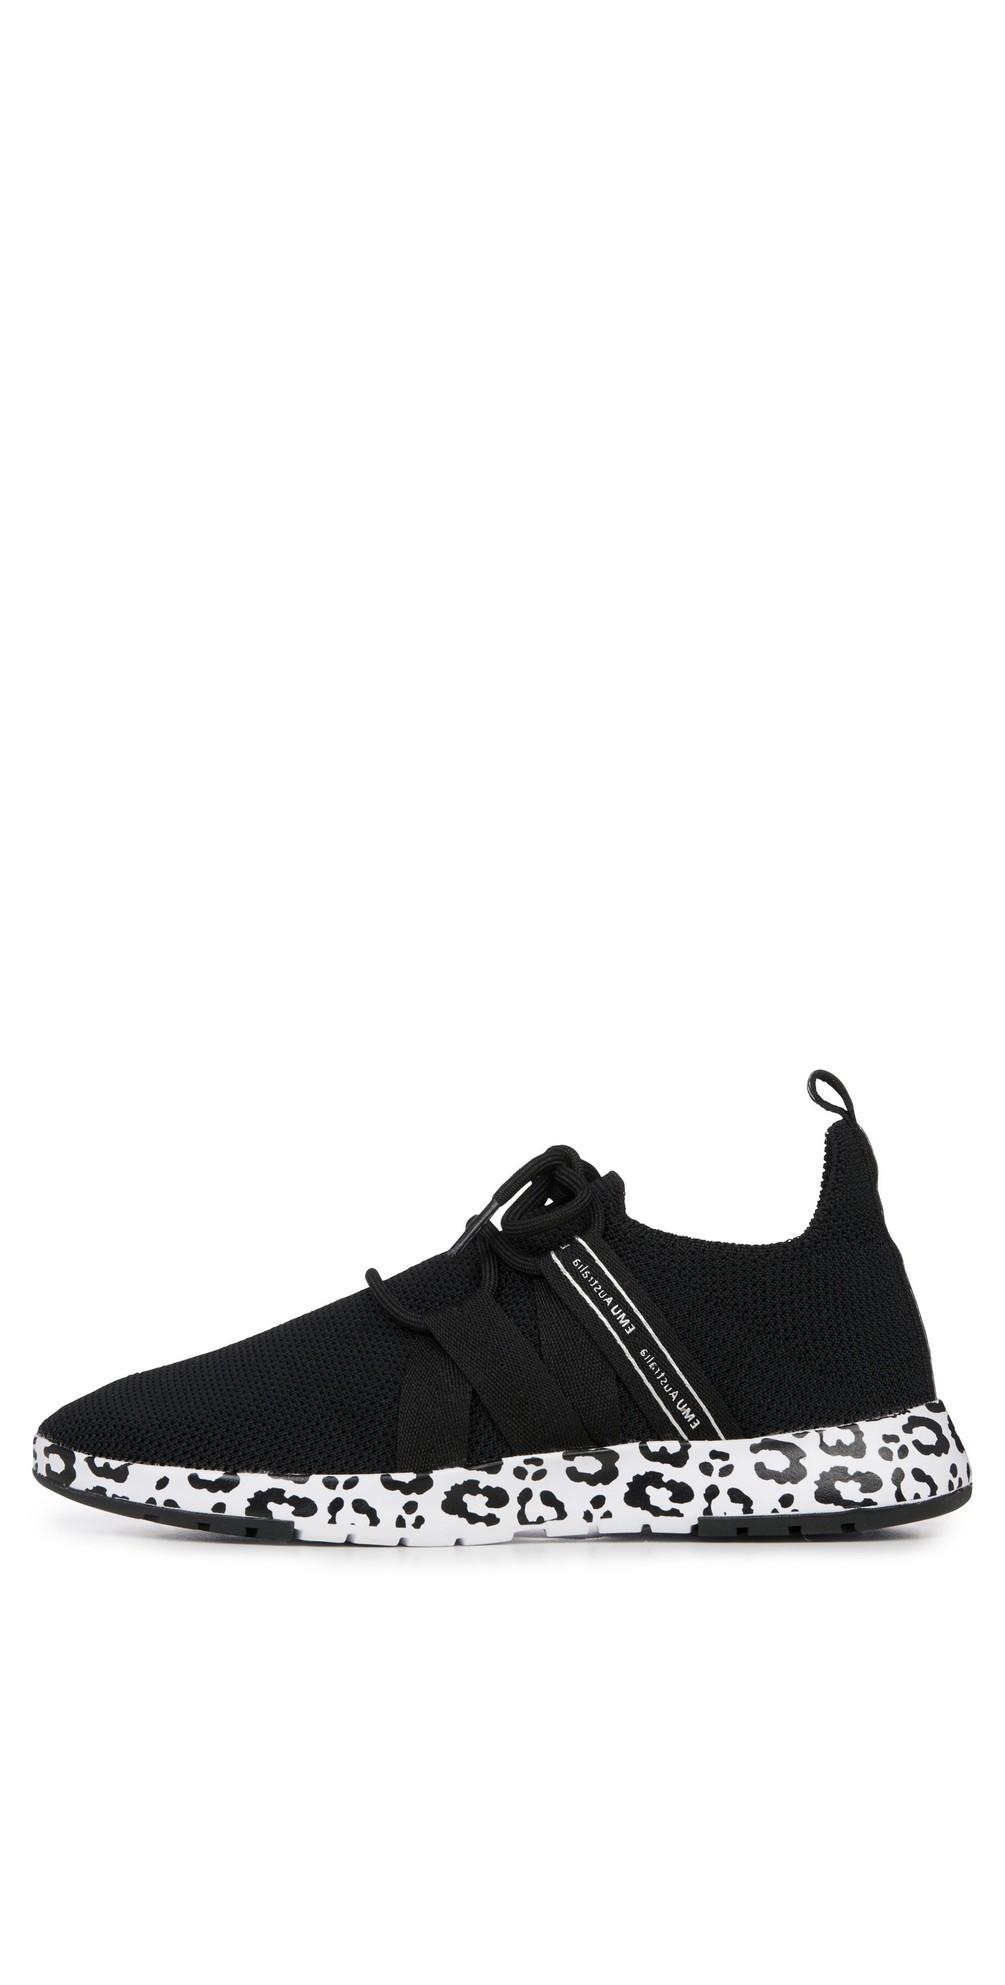 Leura Black Leopard Washable Sneaker main image